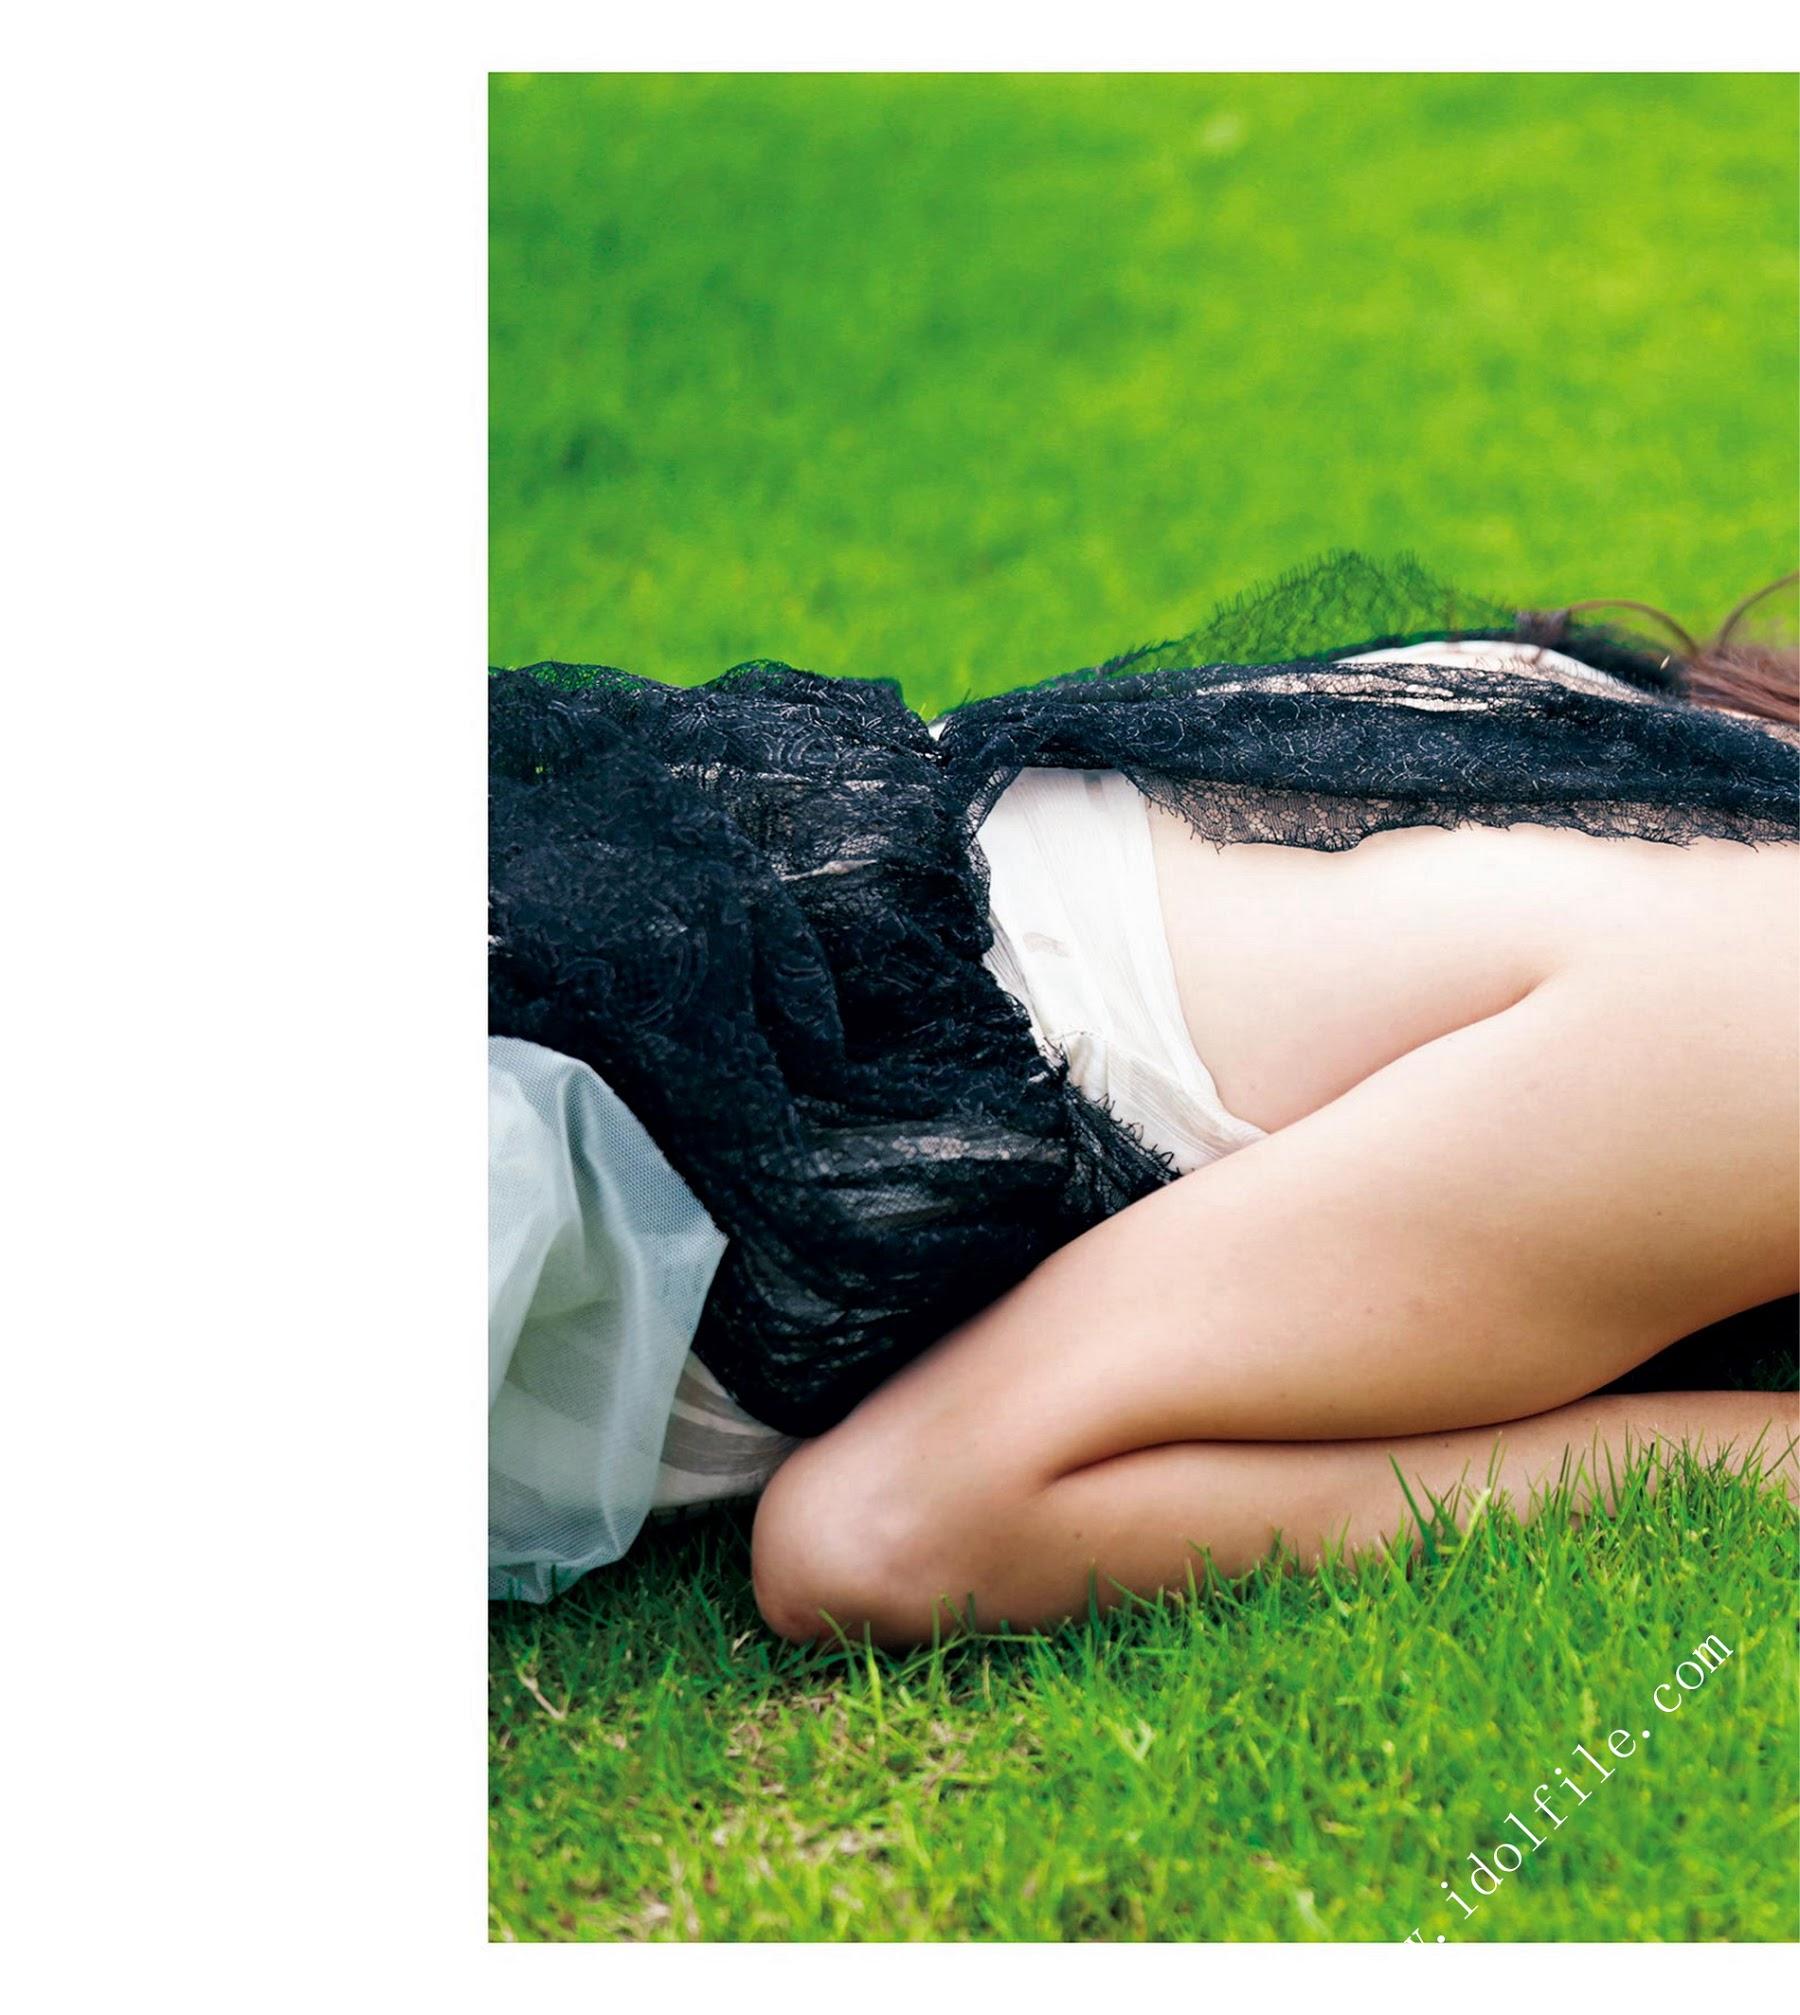 Dignity of Eros Mana Hashimoto074